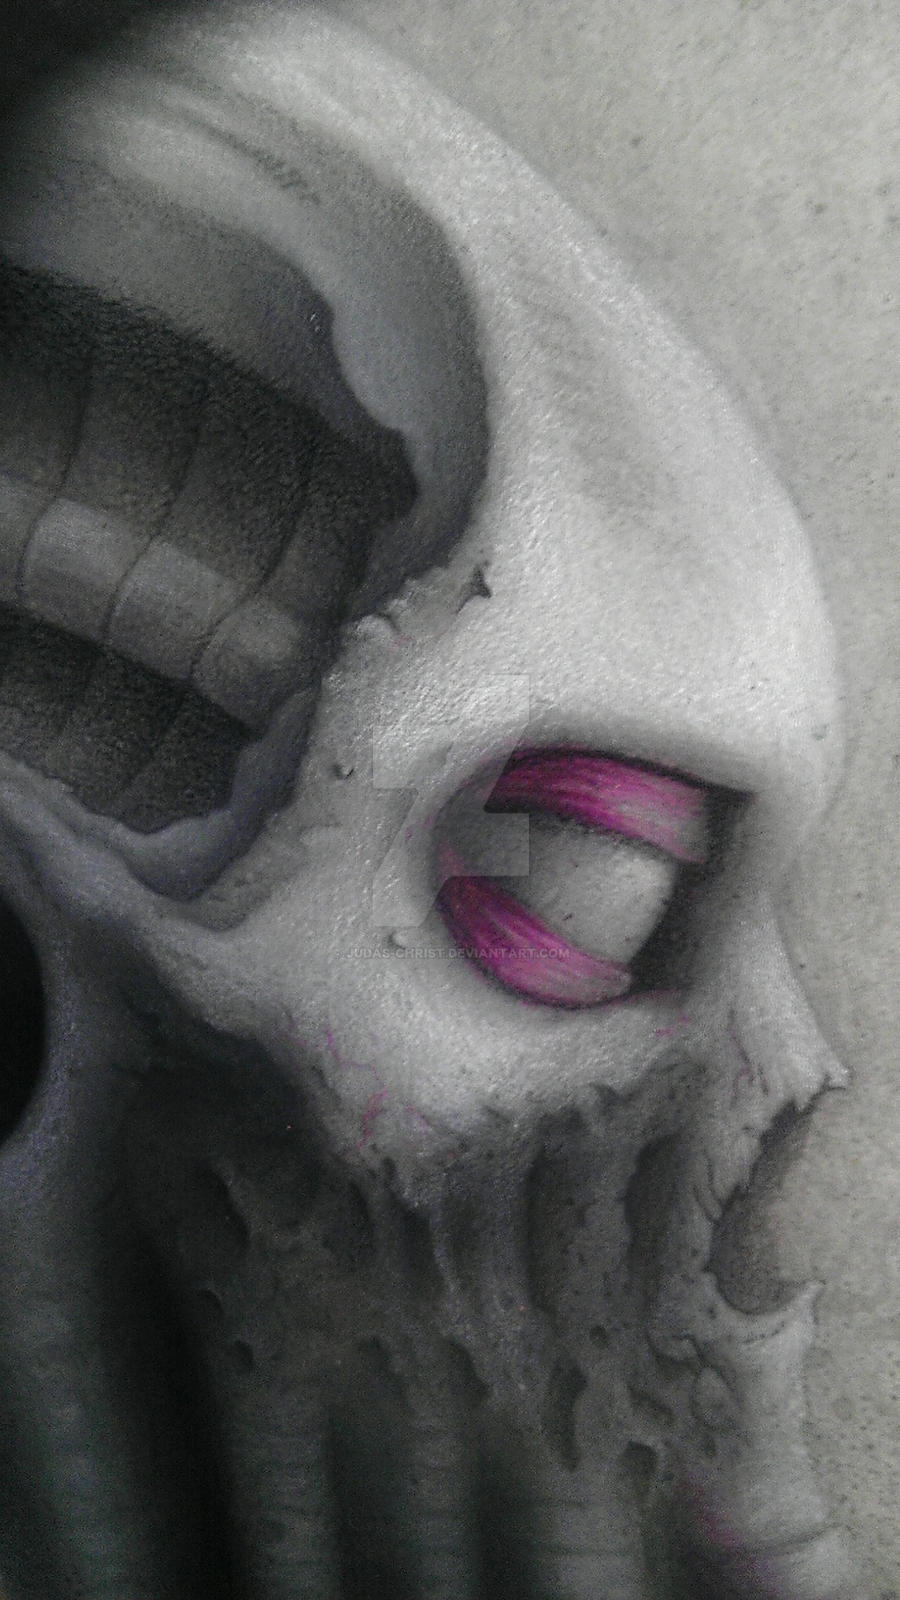 cthulhu thing detail by judas-christ